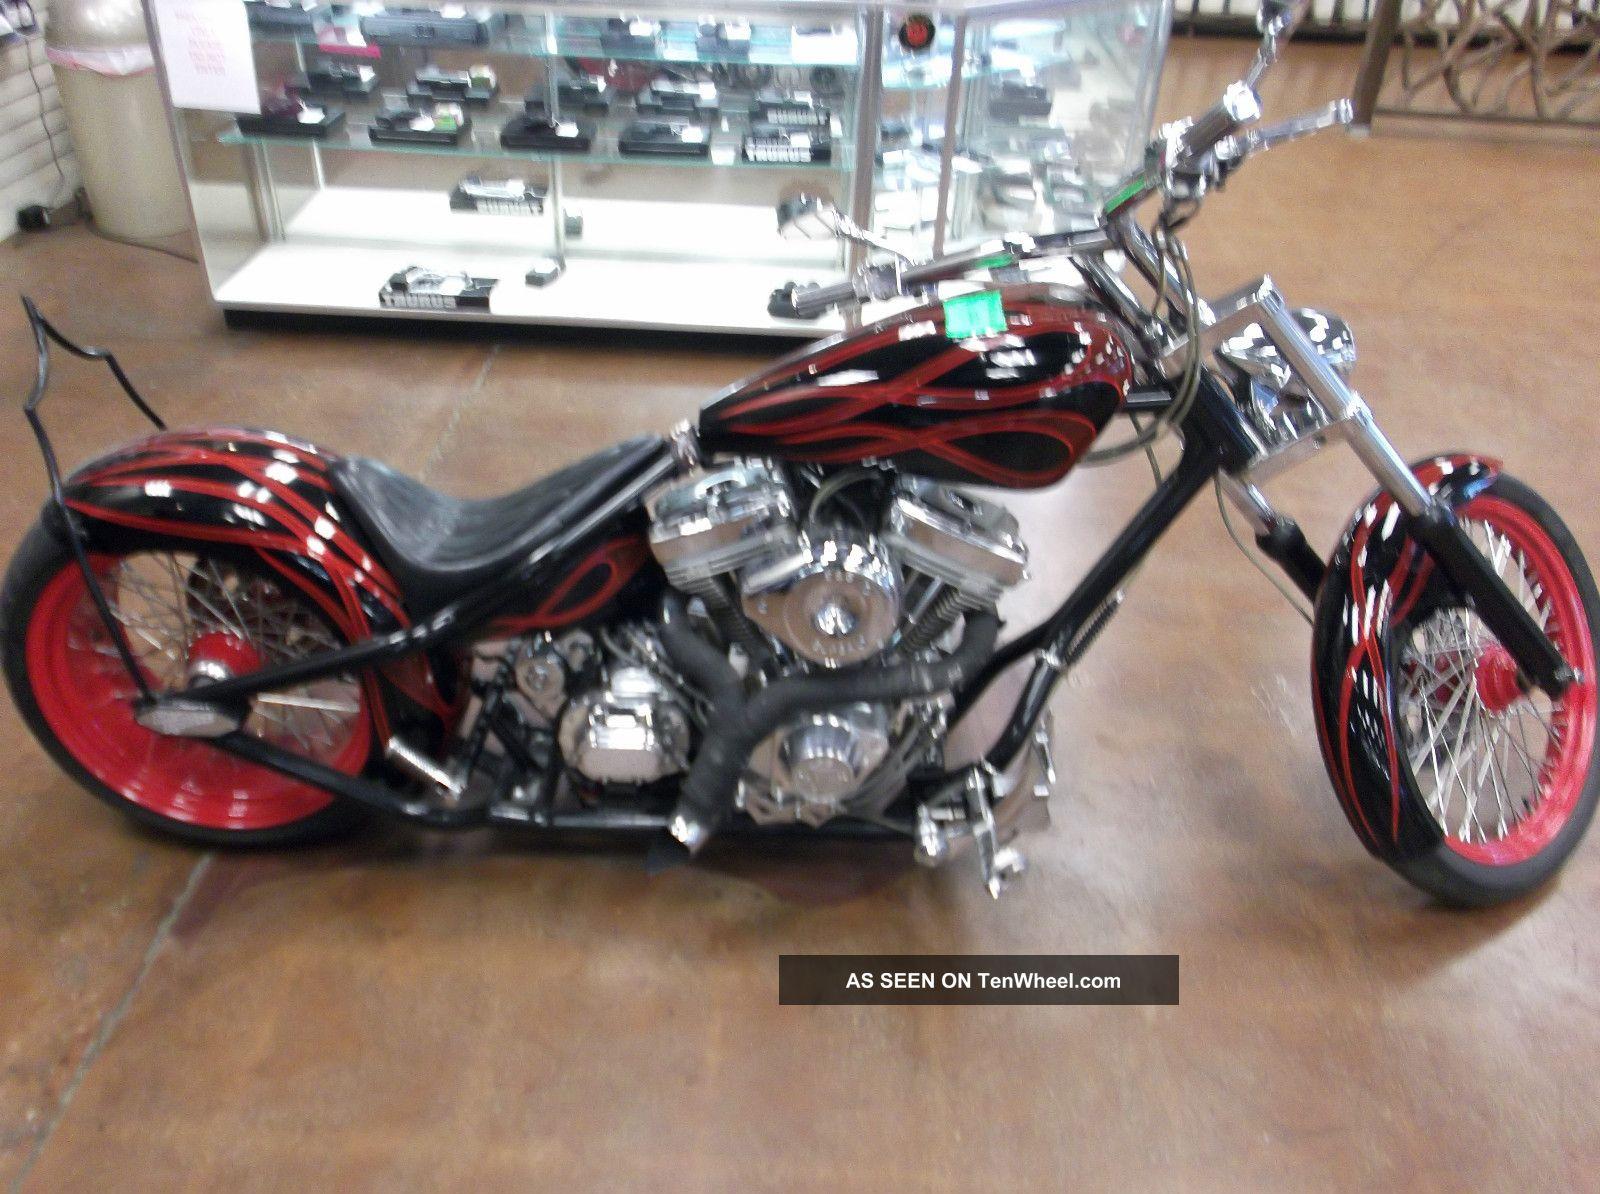 2004 Redneck Lowlife Custom Motorcycle Other Makes photo